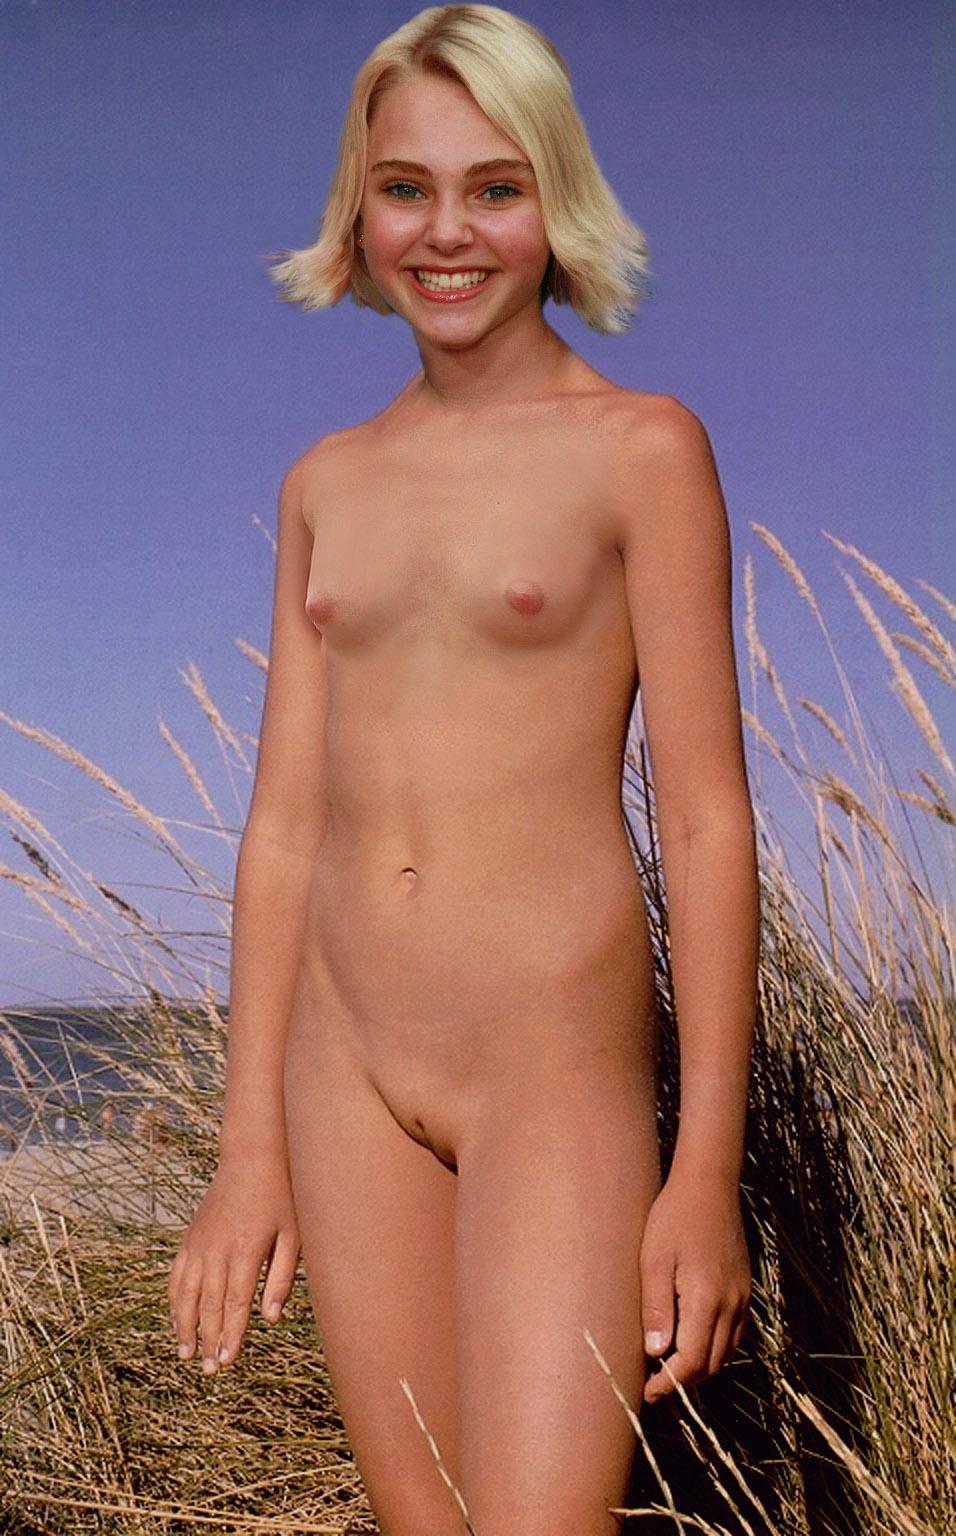 midna ass hole naked